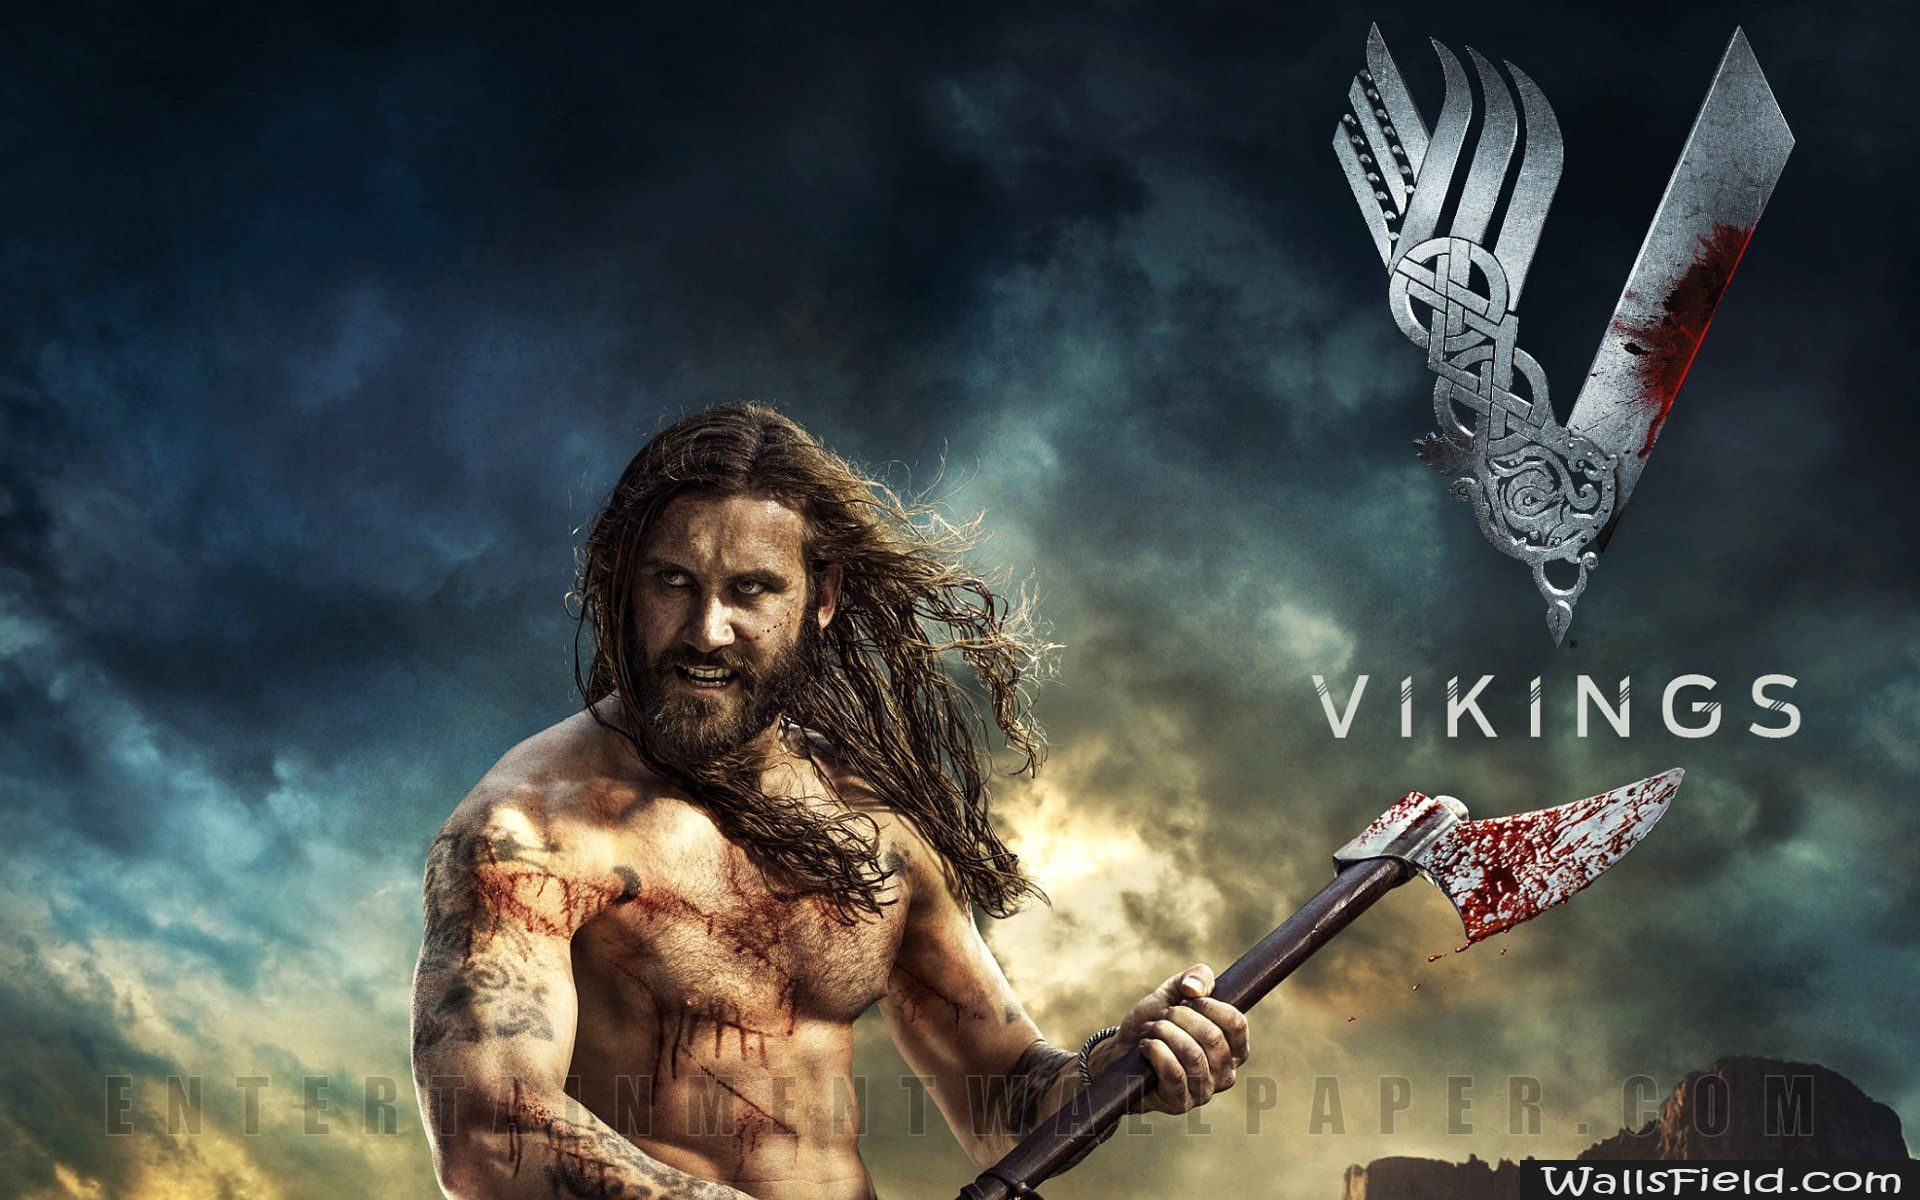 Vikings Wallpaper Viking Vikings Vikings Tv Et Viking Wallpaper